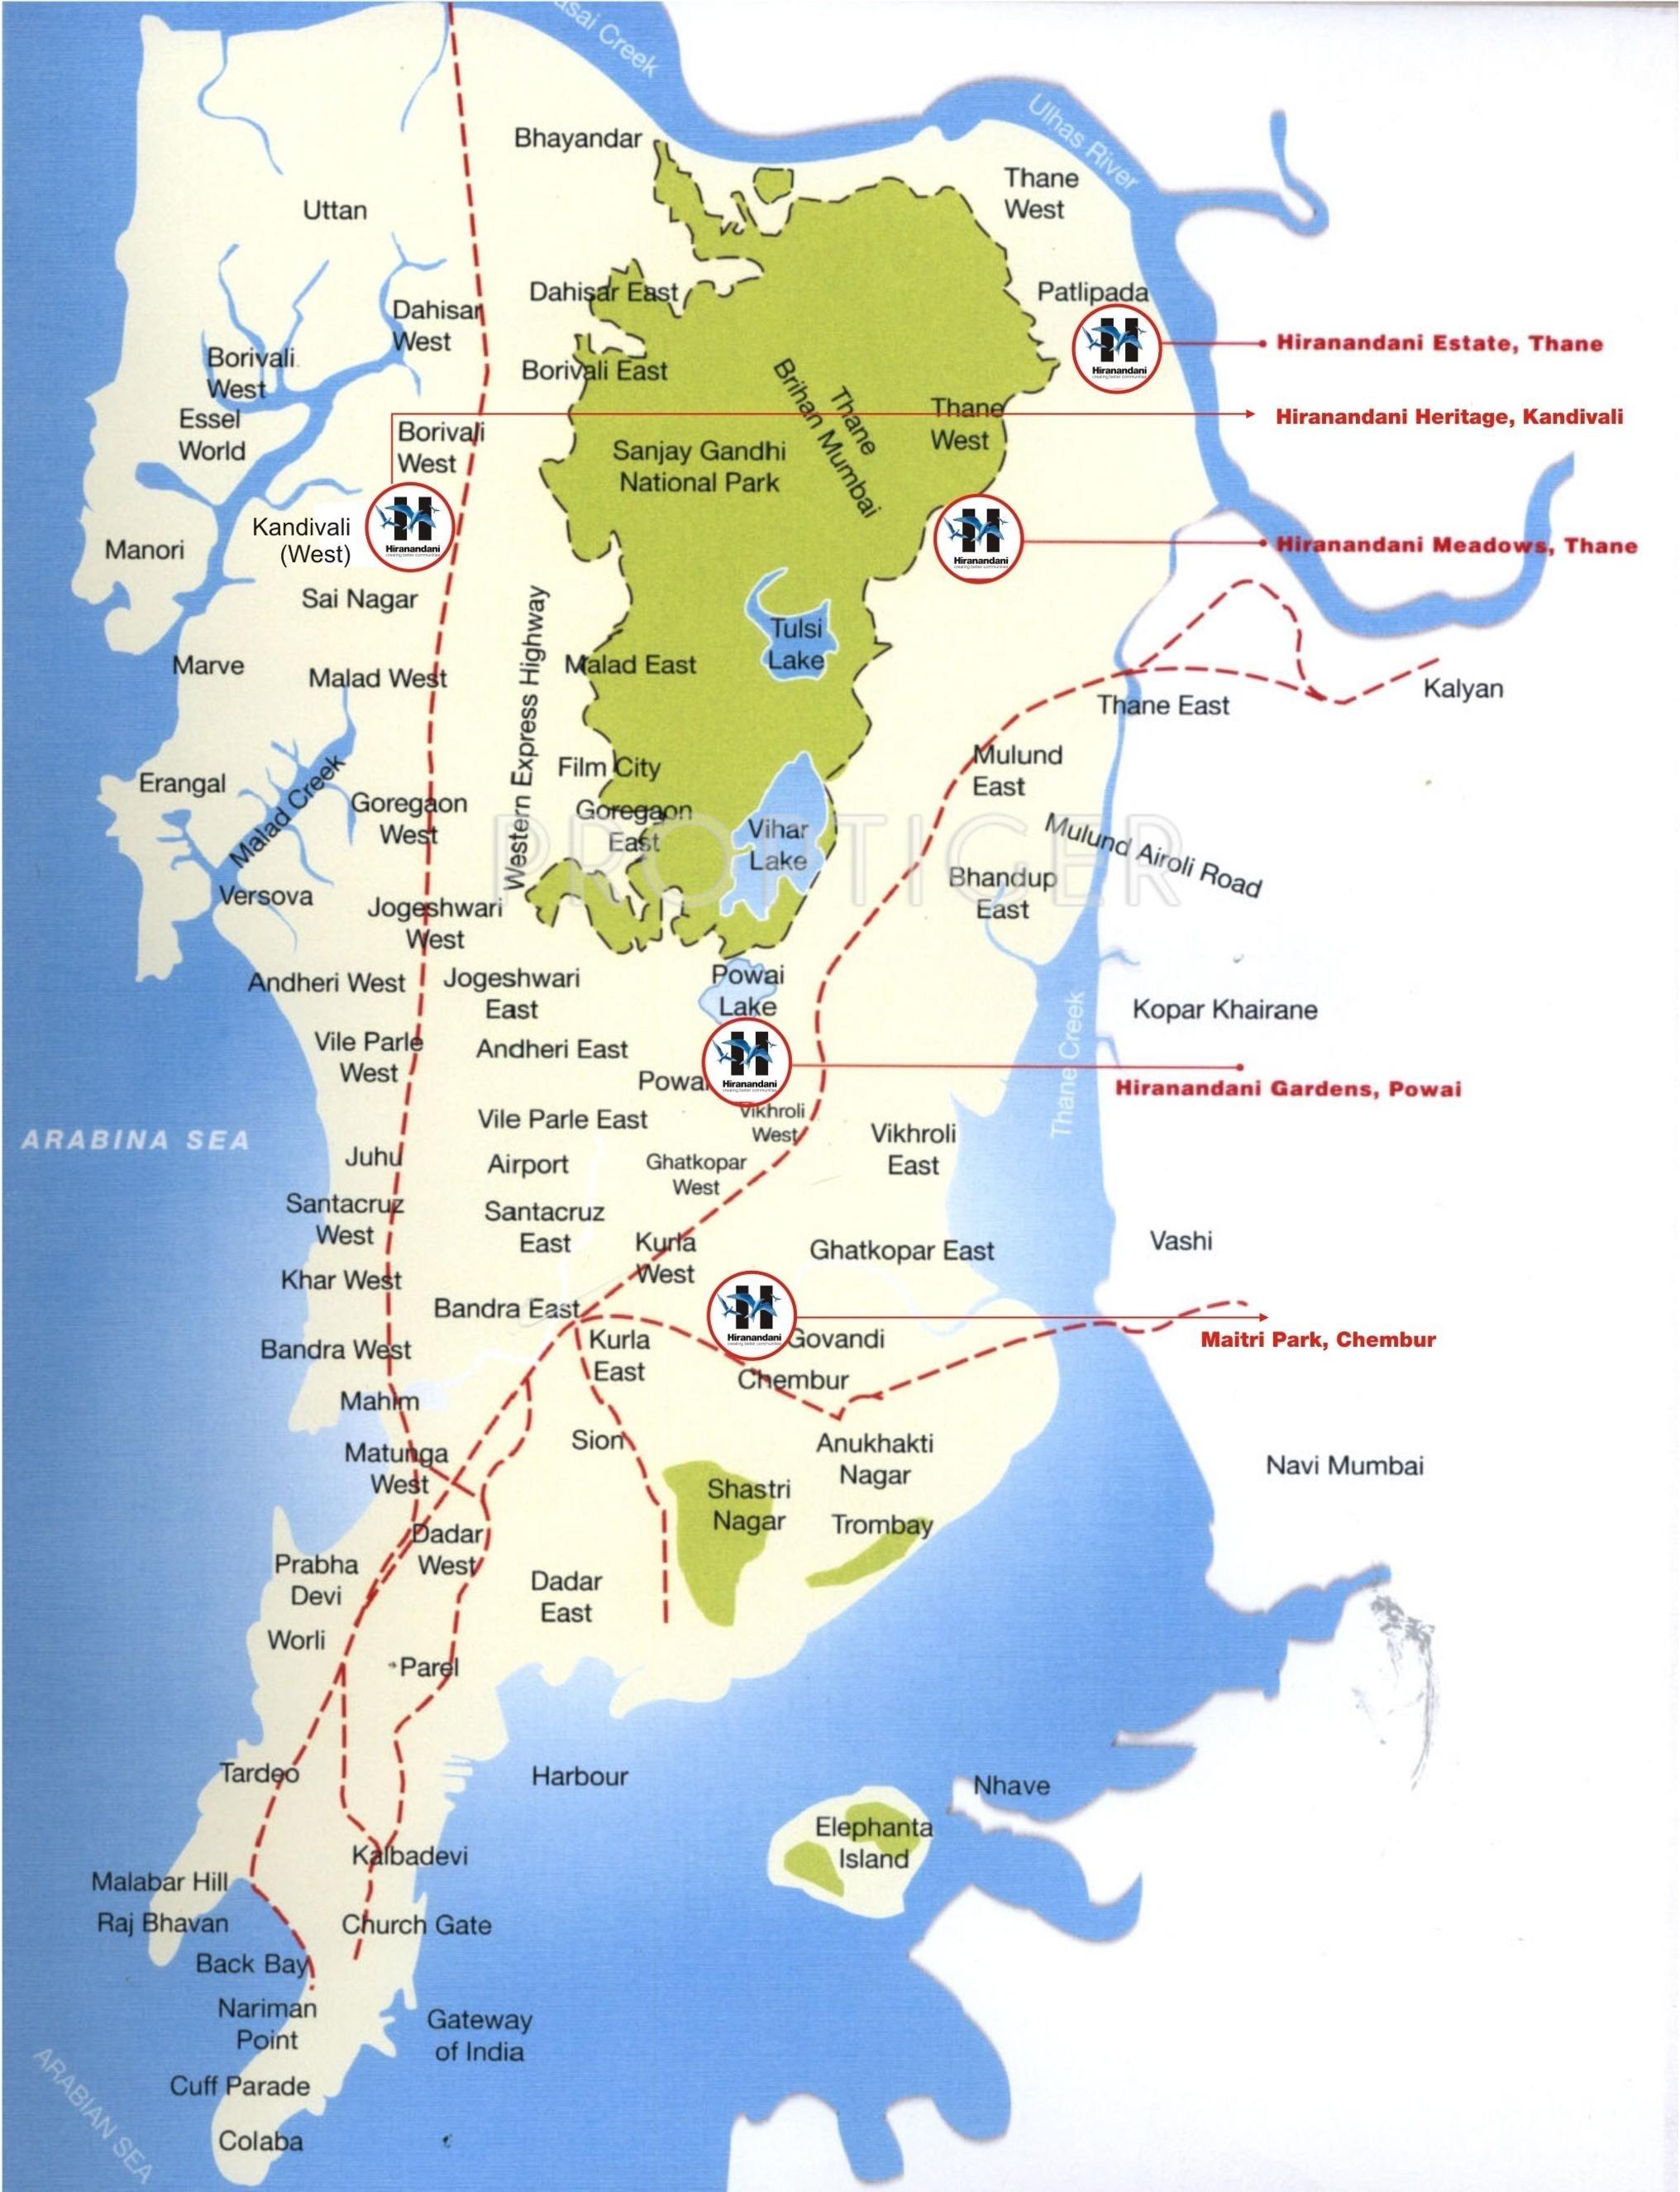 Avalon Floor Plan Hiranandani Gardens In Powai Mumbai Price Location Map